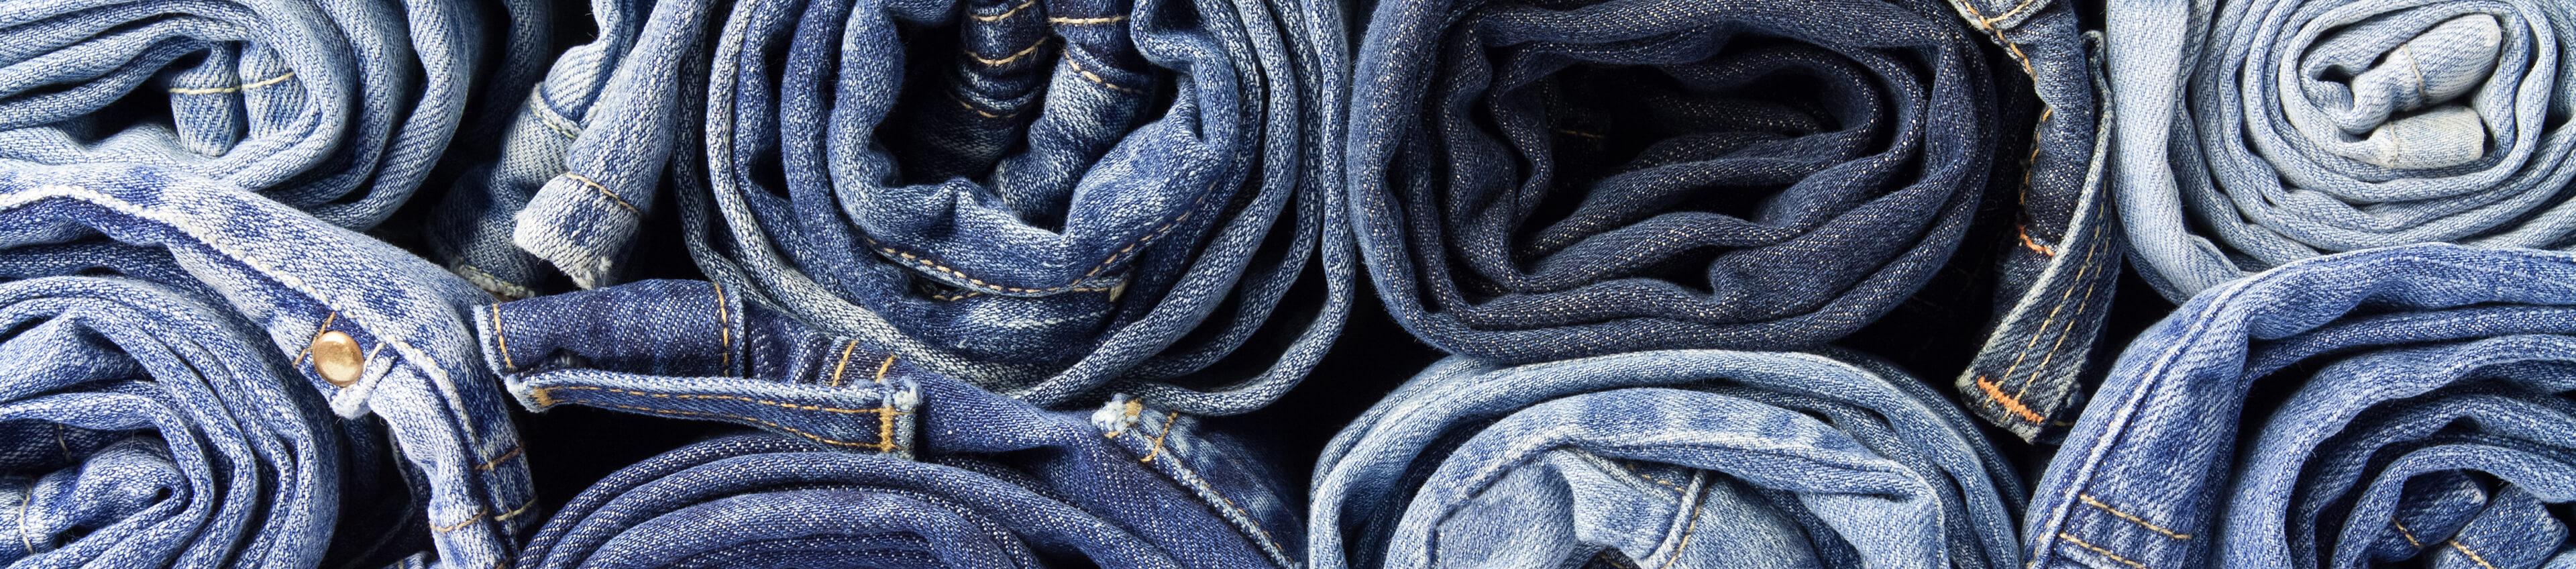 Black Friday Jeans